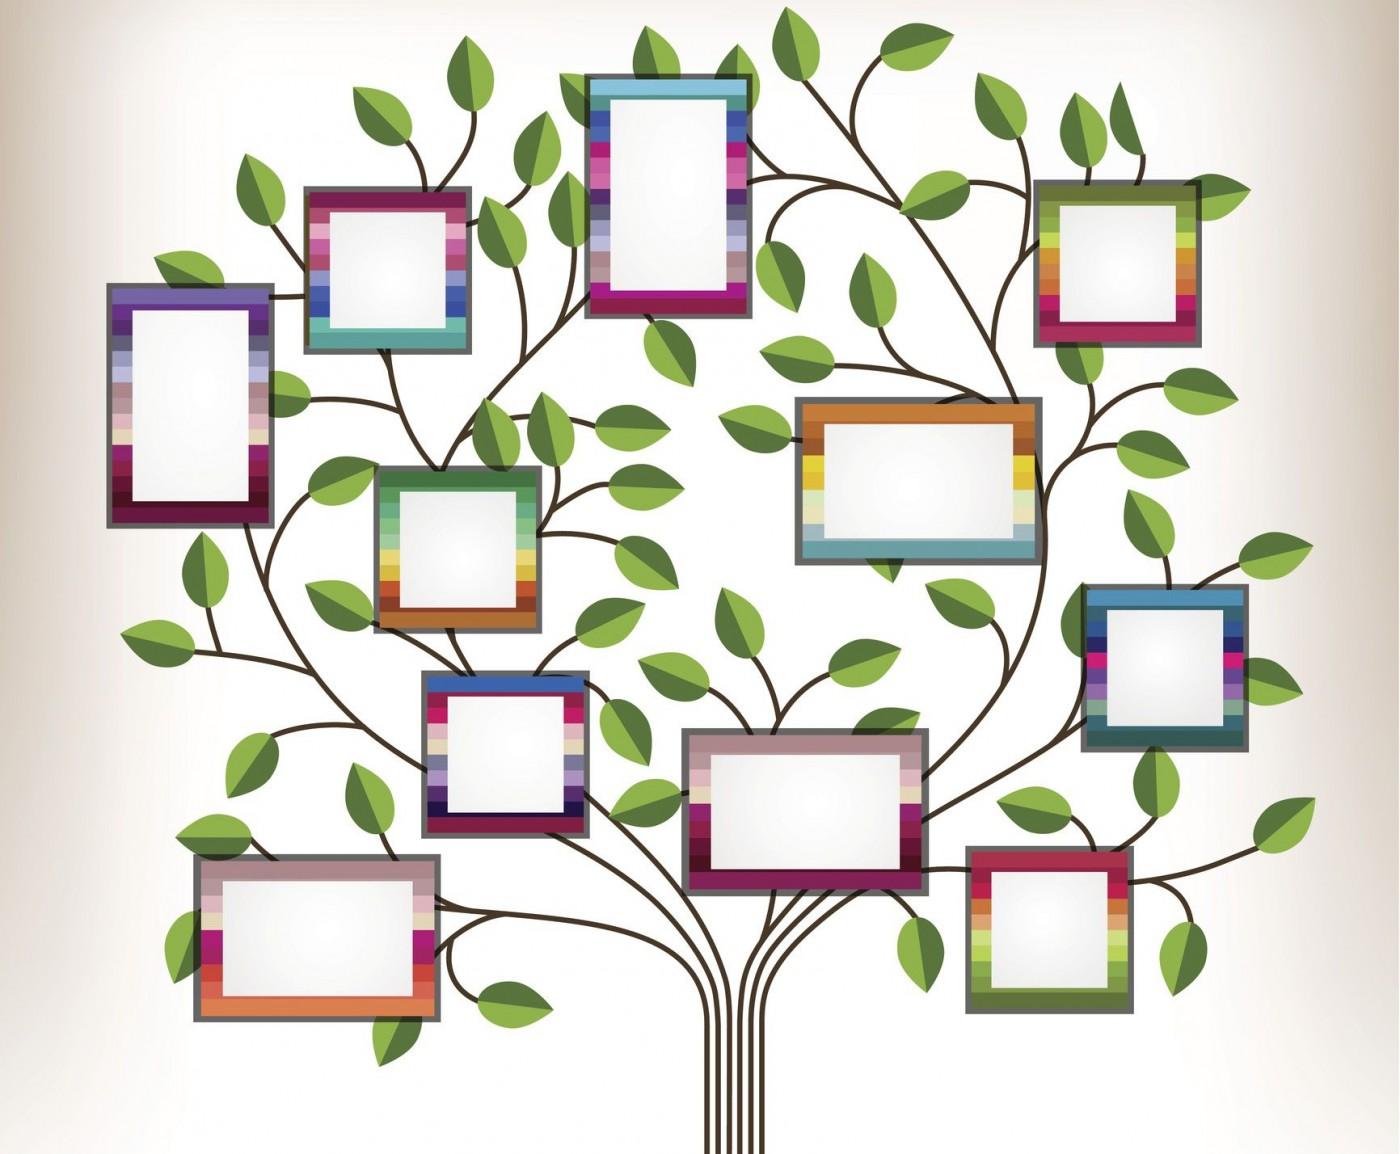 005 Sensational Family Tree For Baby Book Template Inspiration  Printable1400